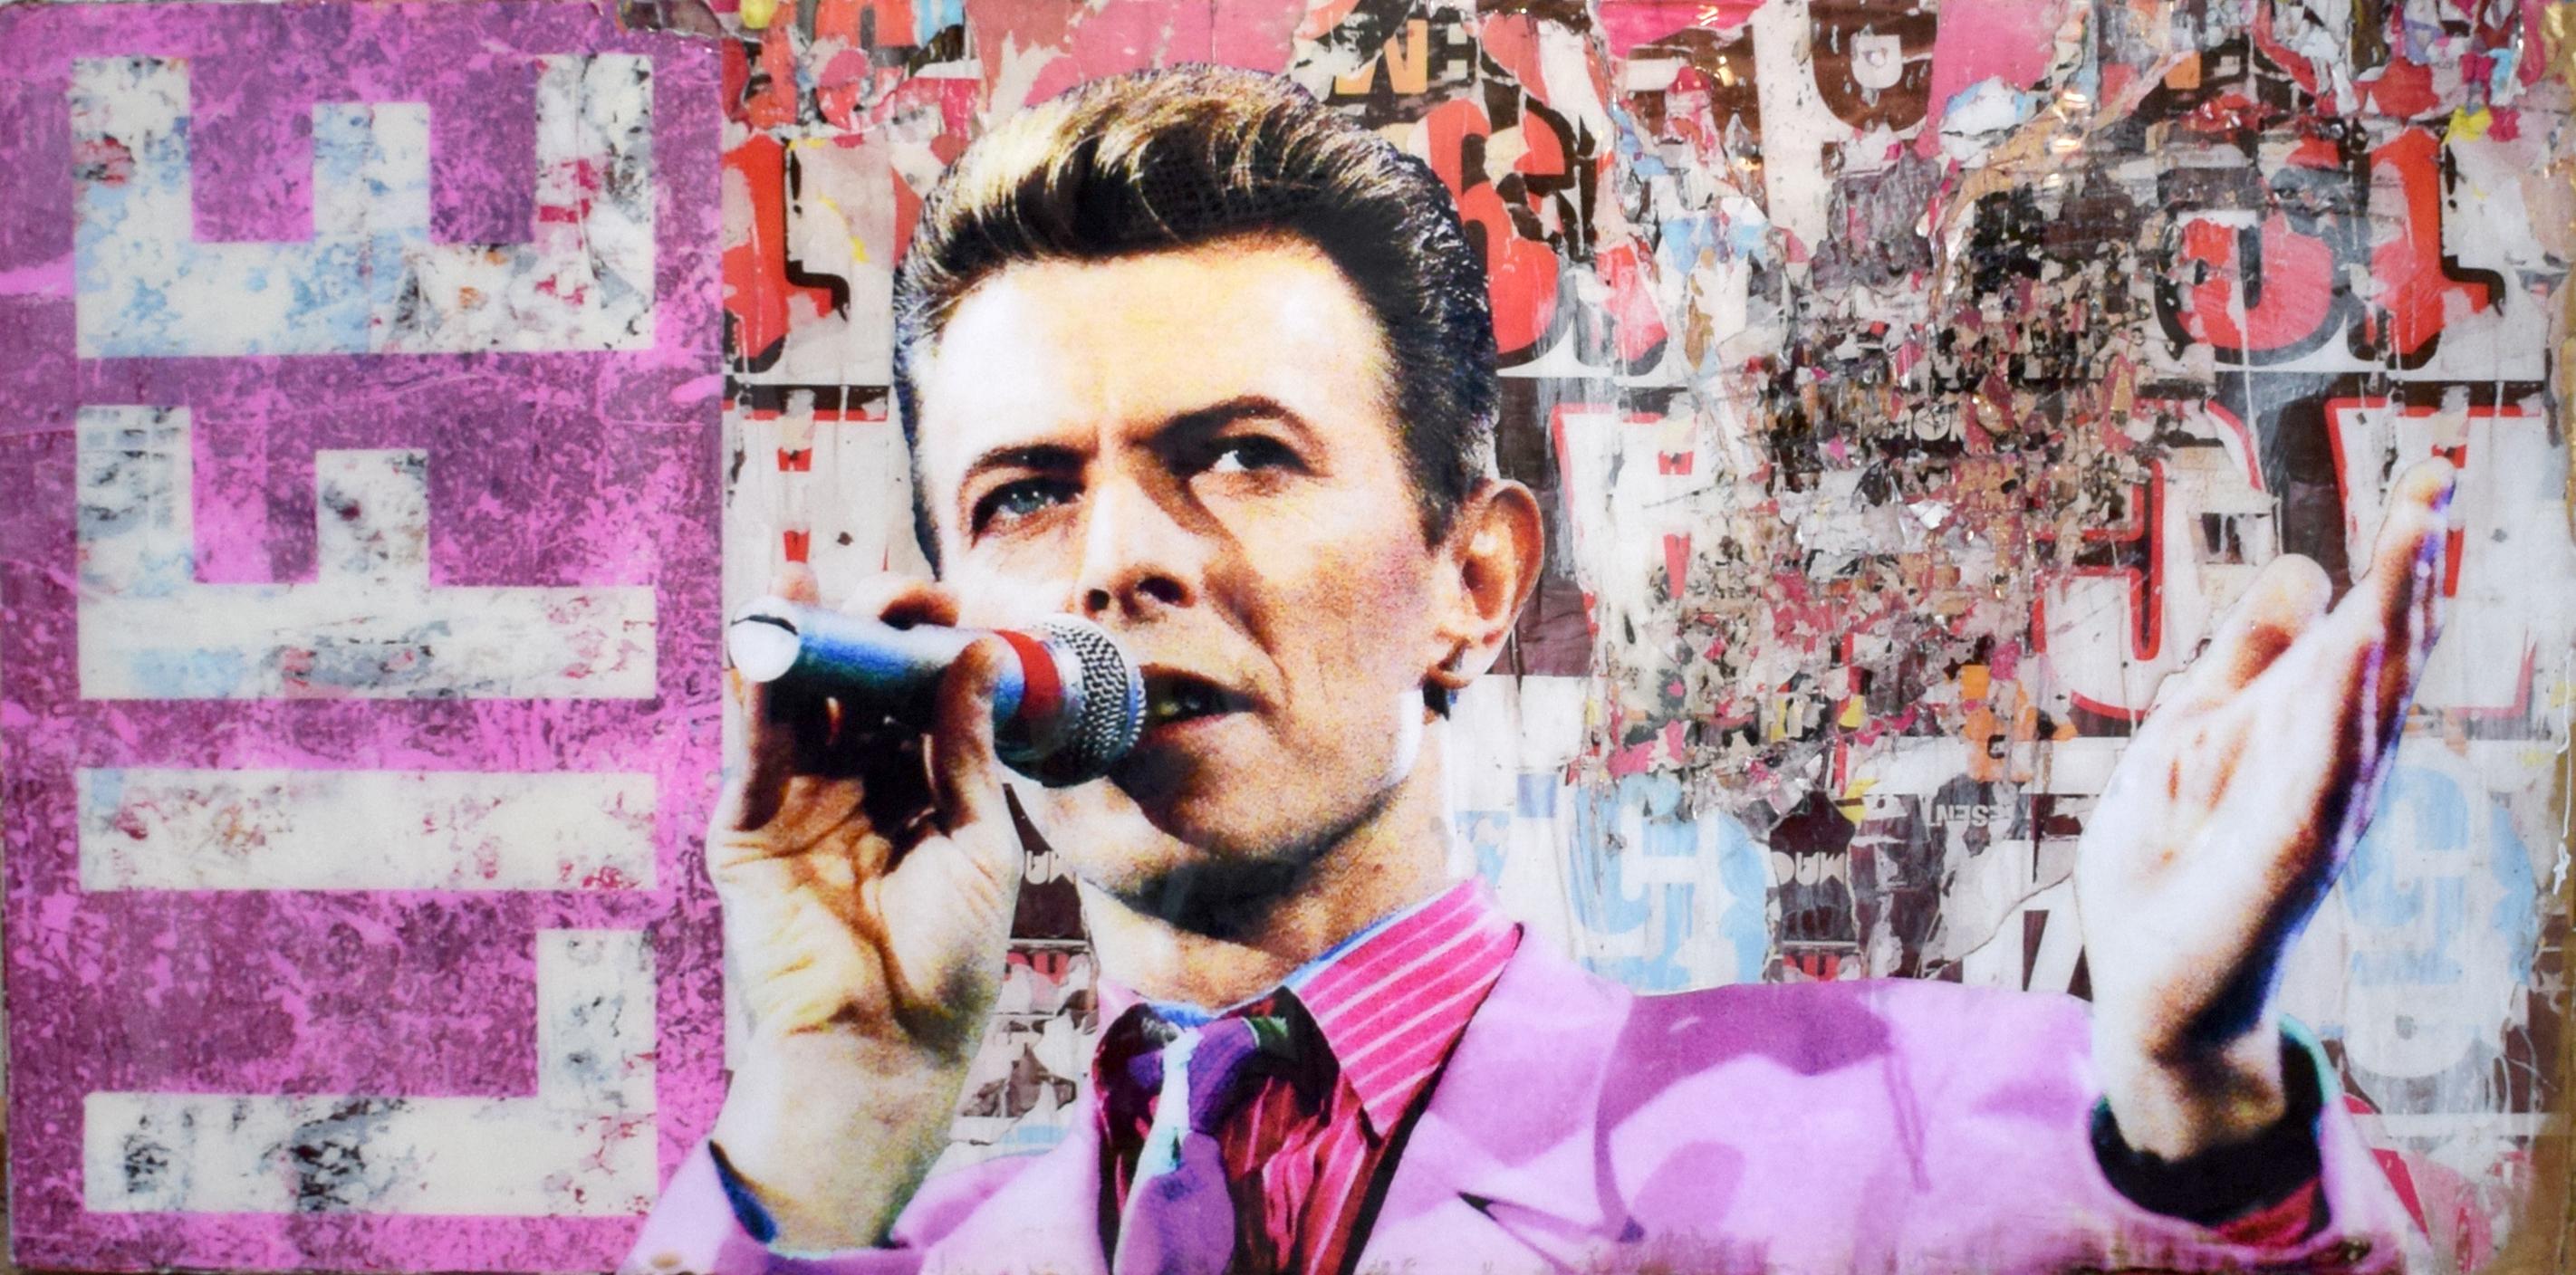 Bram Reijnders - Pink Bowie , 8029-012-765